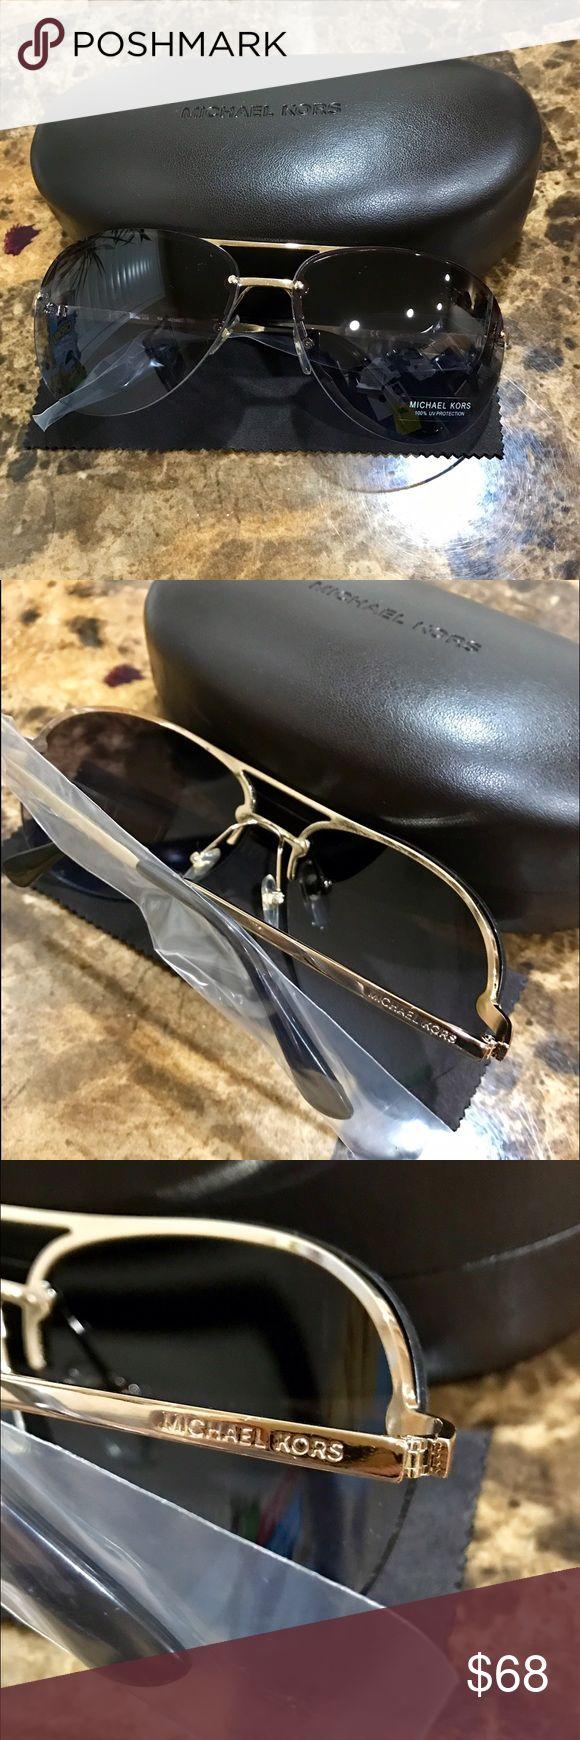 Michael Kors Aviator Sunglasses Brand New!! Comes with case and dust cloth , Michael Kors Aviator Sunglasses $100 Retail Michael Kors Accessories Sunglasses